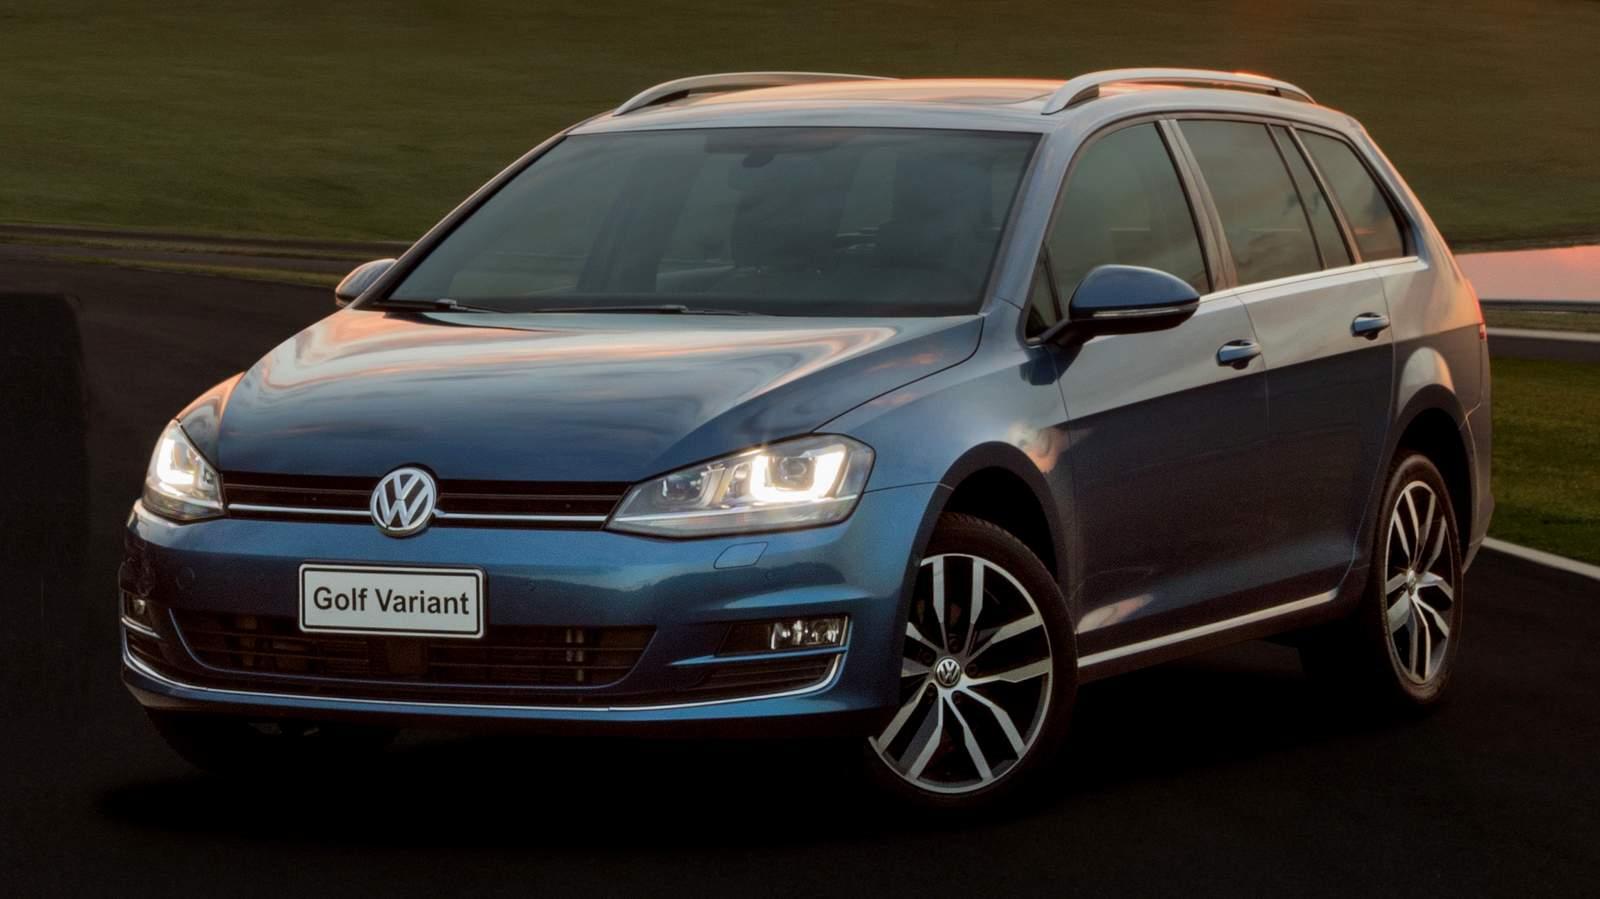 VW-Golf-Variant-2016 (1)